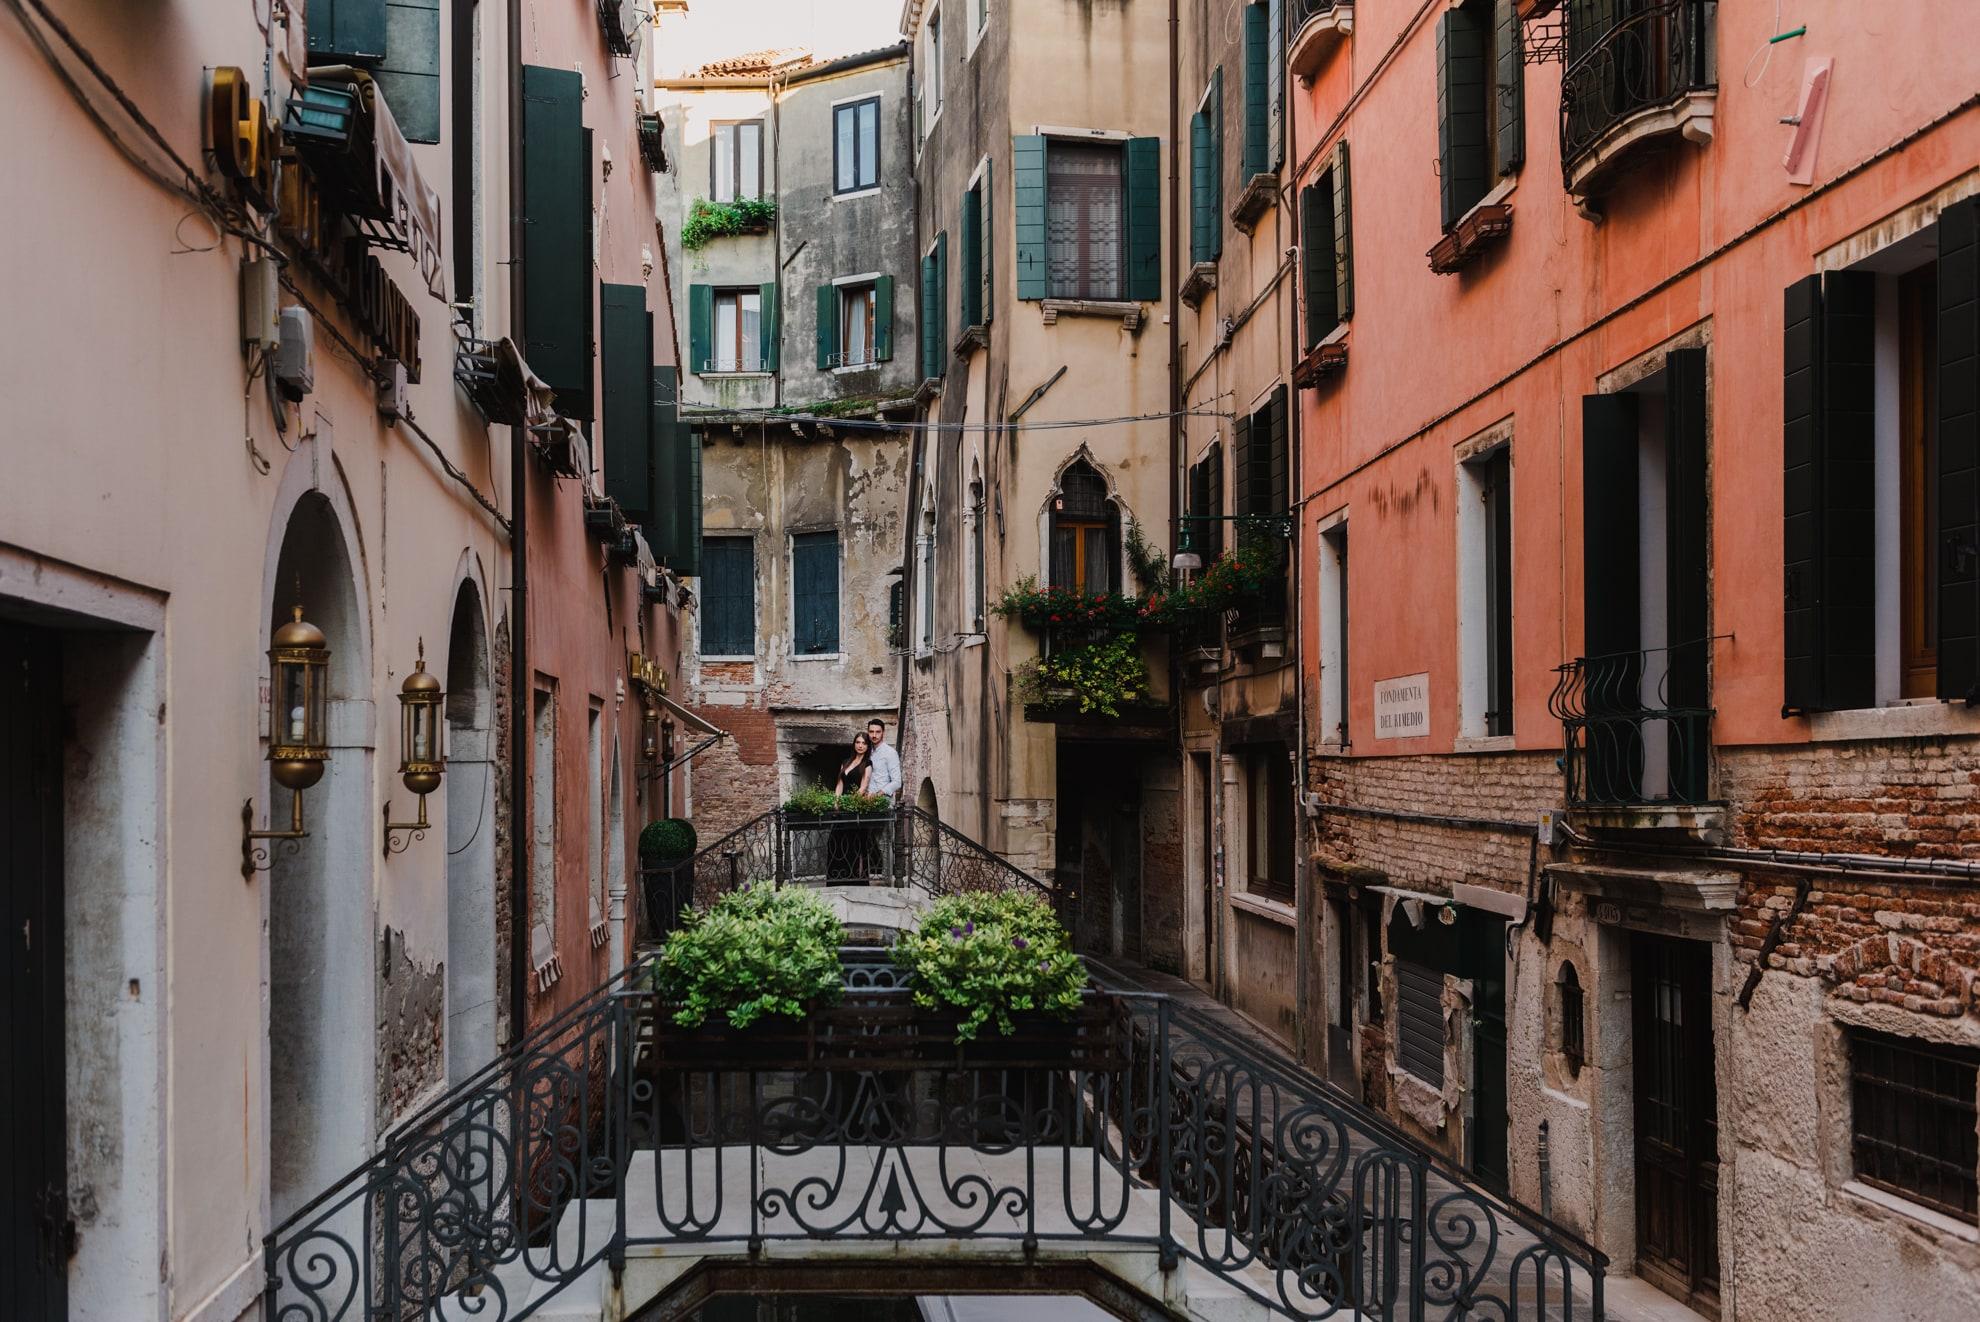 engagement venice venezia proposal proposta matrimonio fidanzamento irene pollacchi fotografa 4